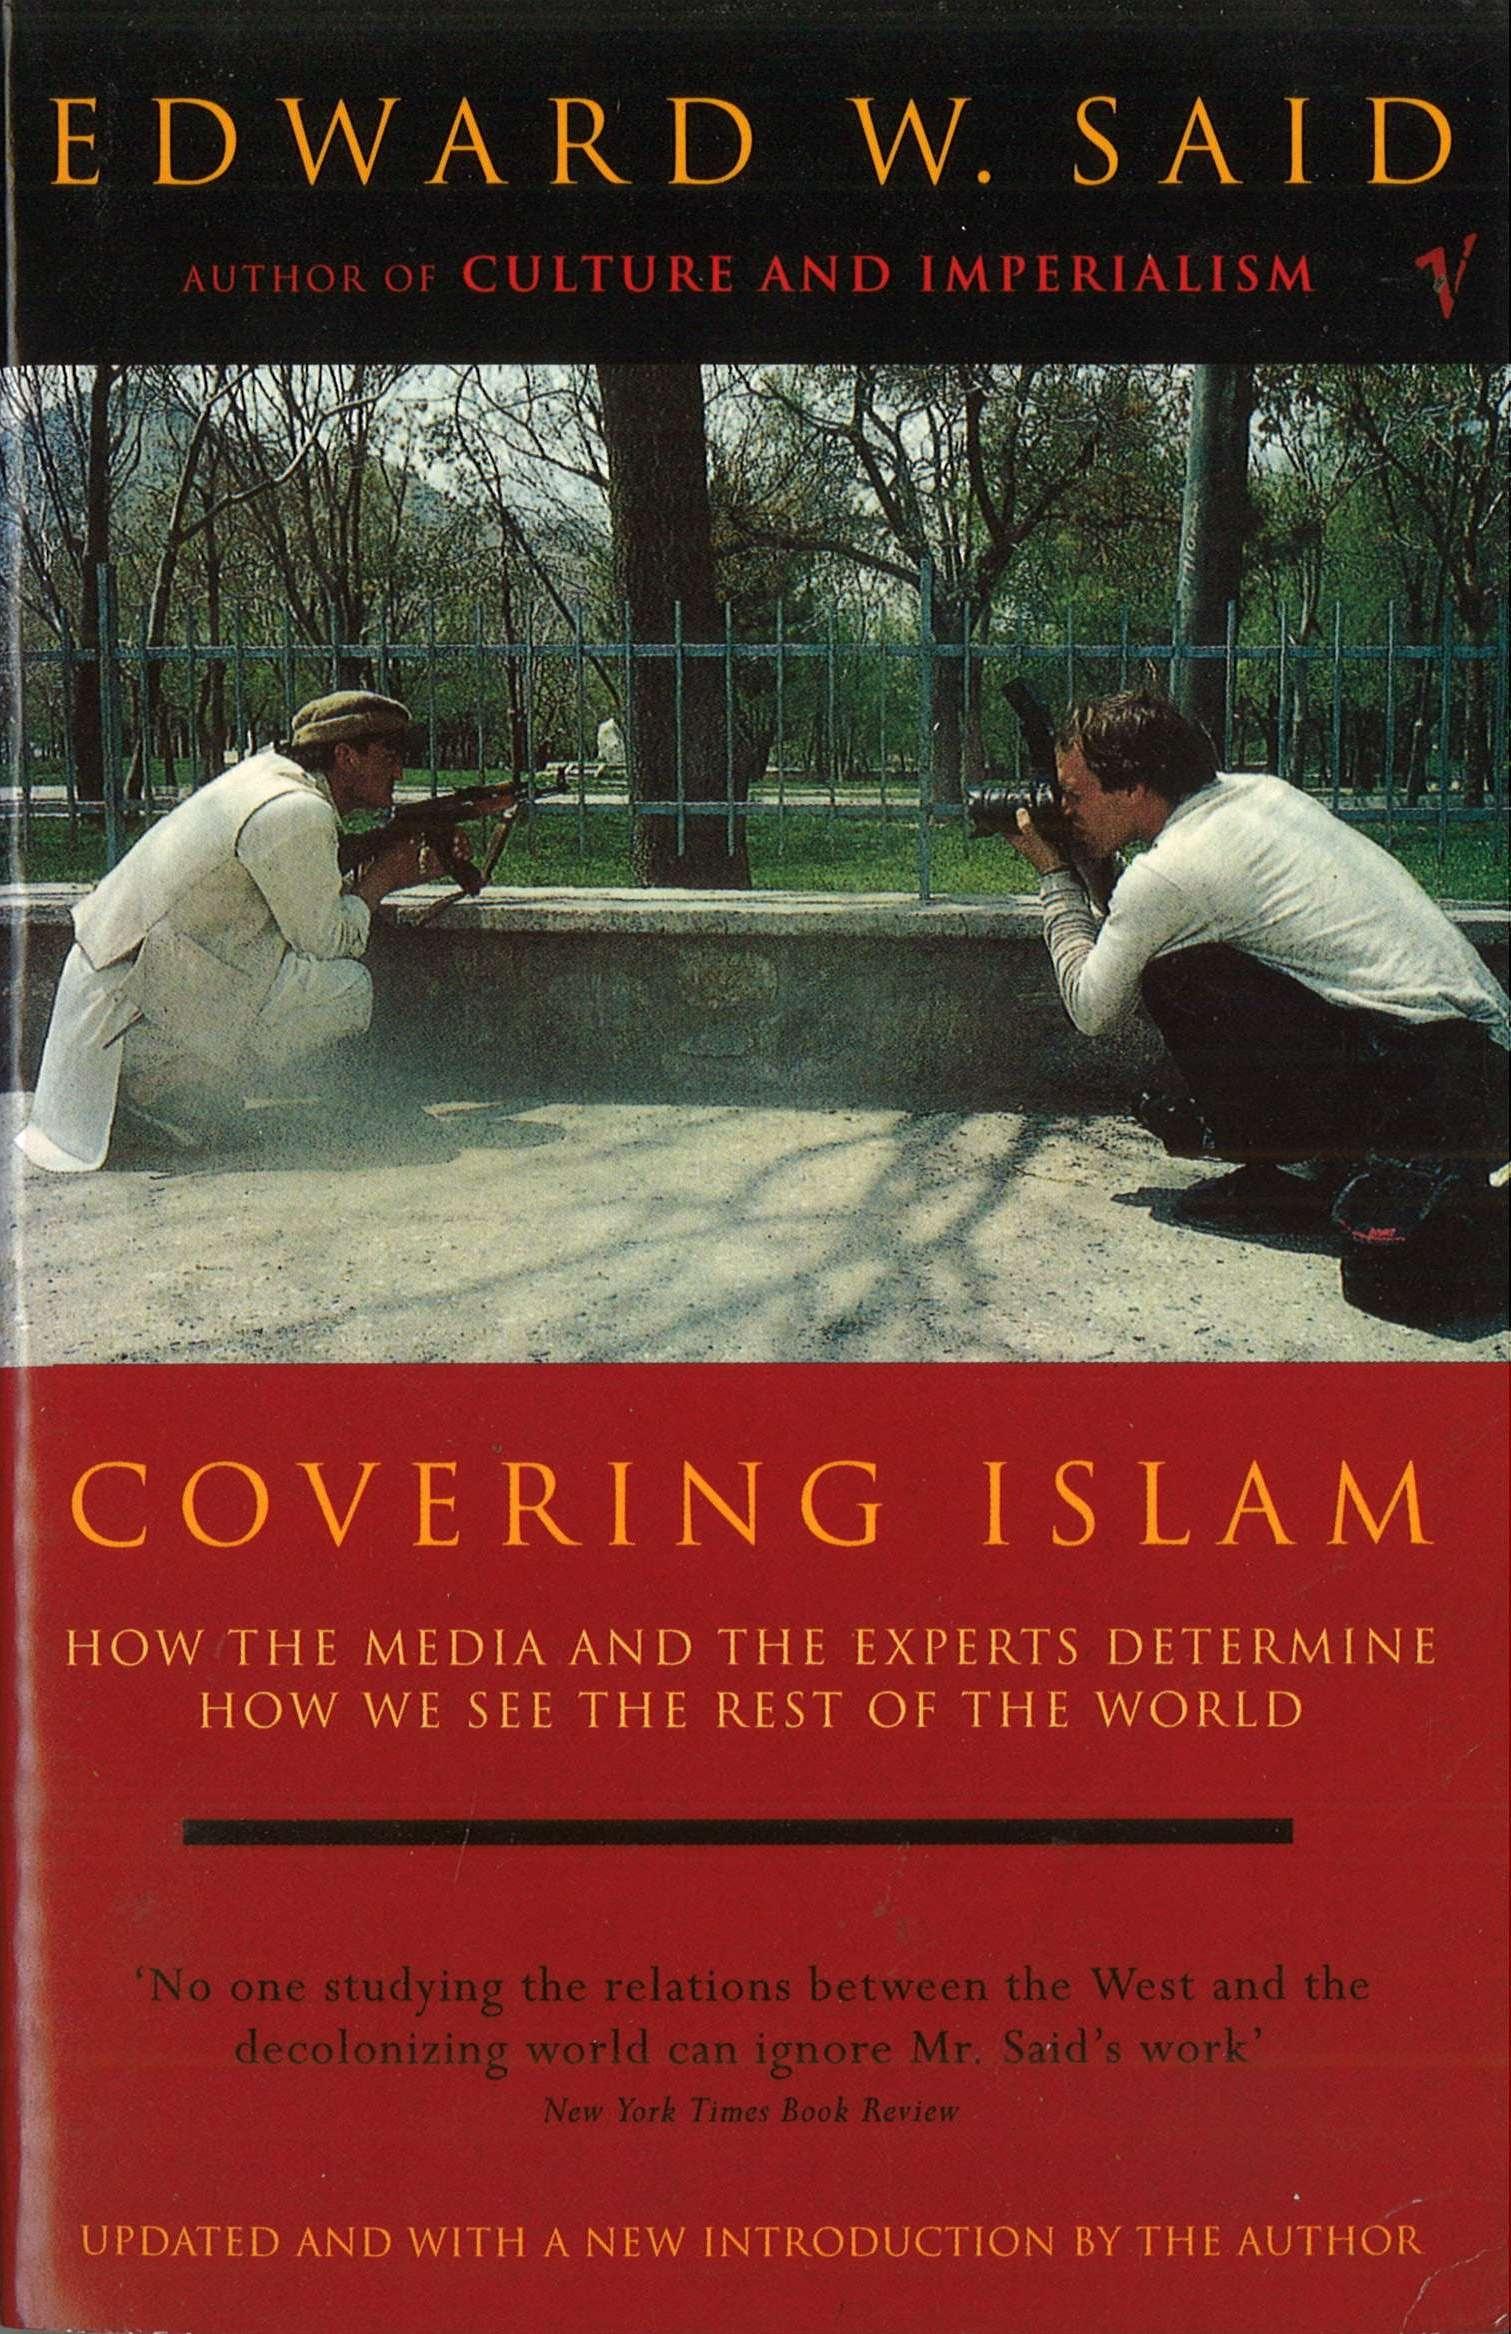 covering islam edward said pdf free download